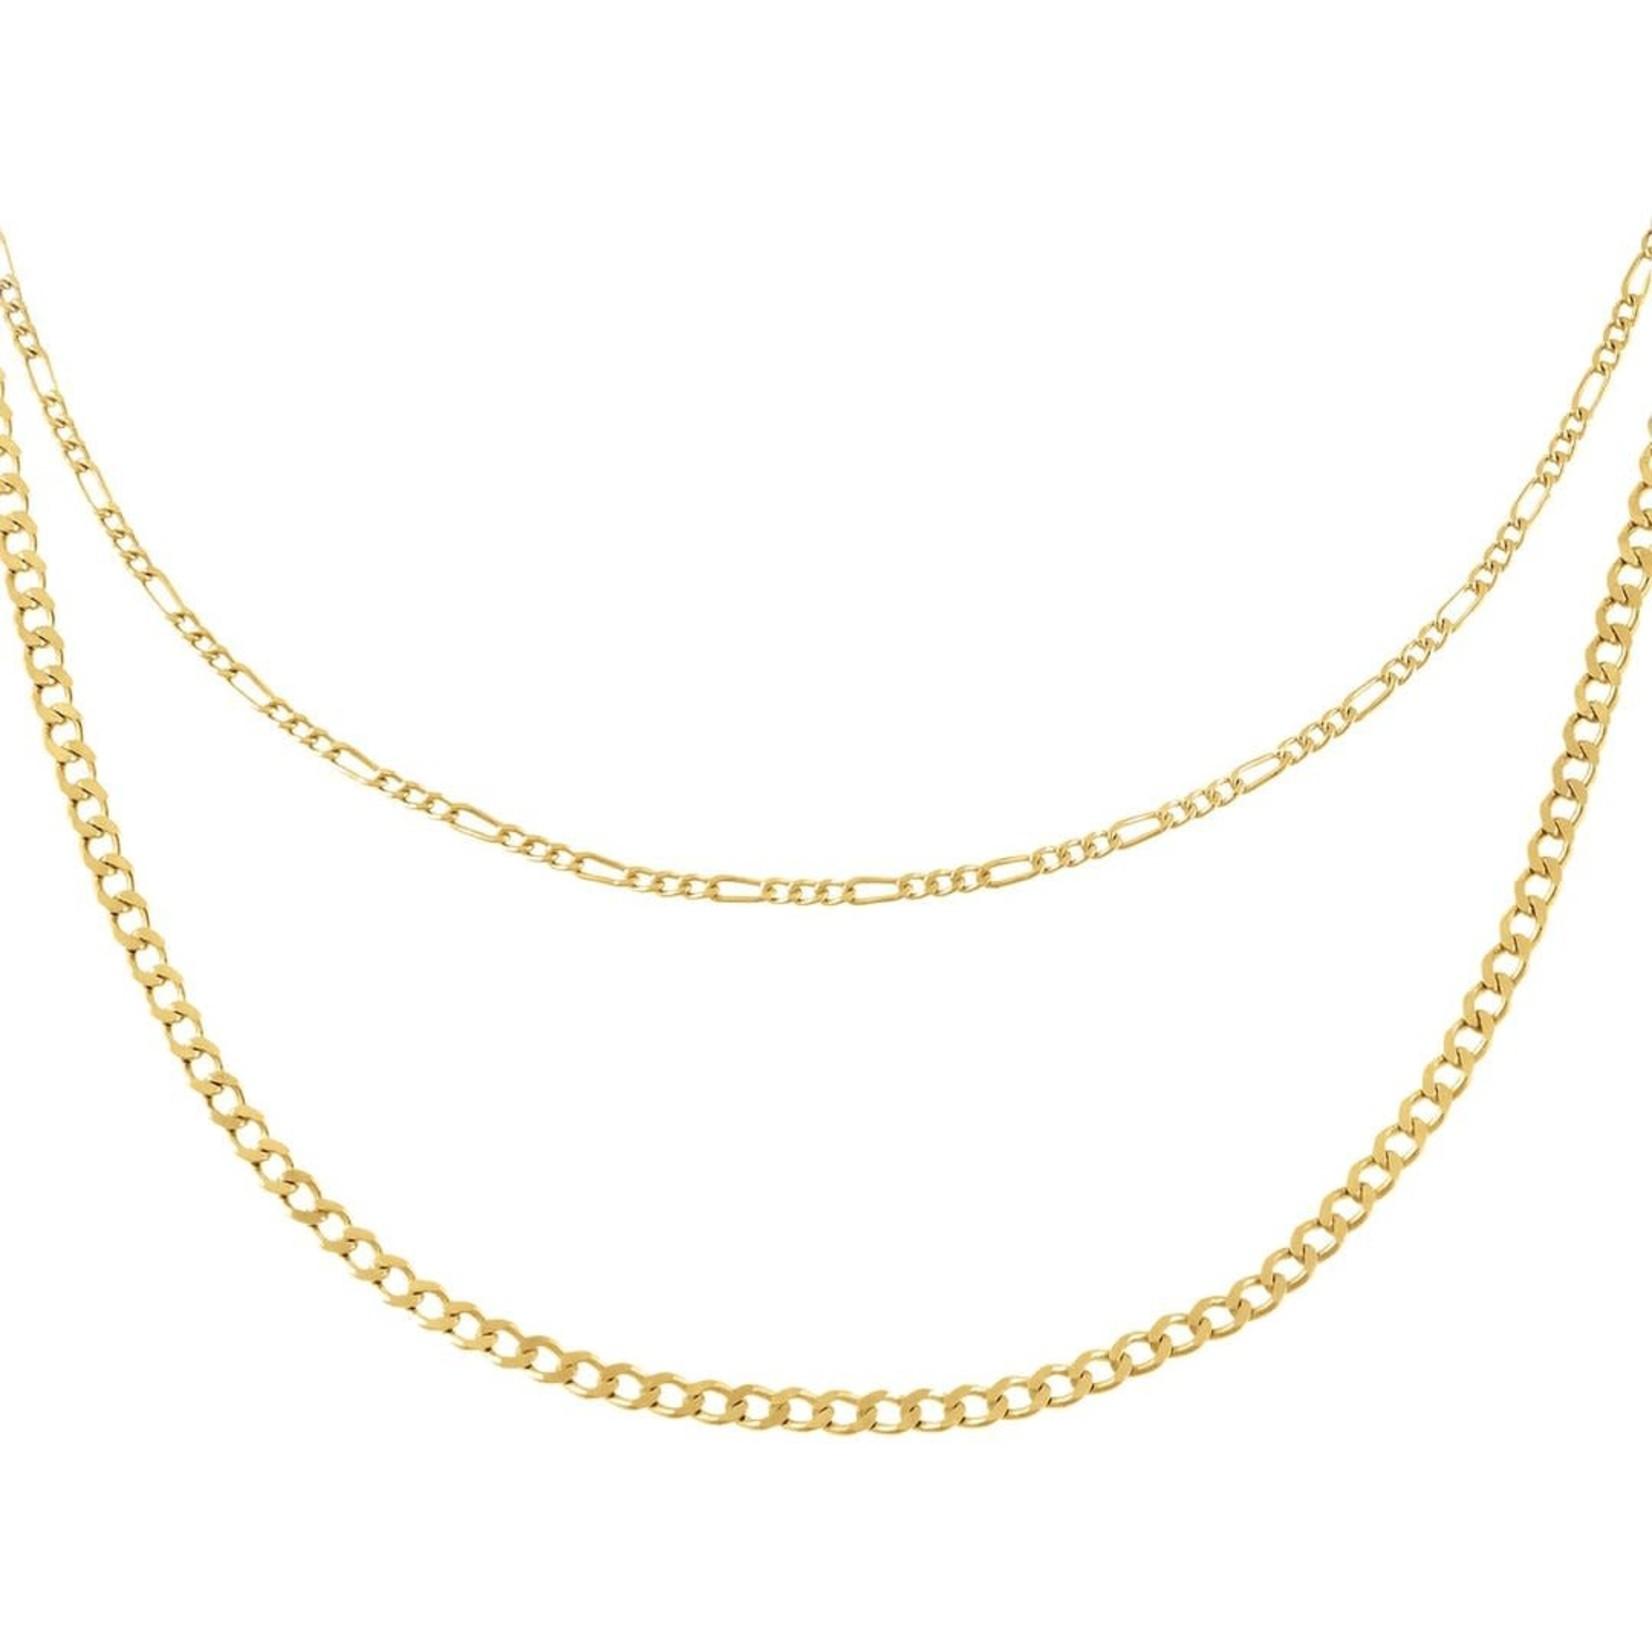 Adinas Double Chain Figaro x Cuban Necklace